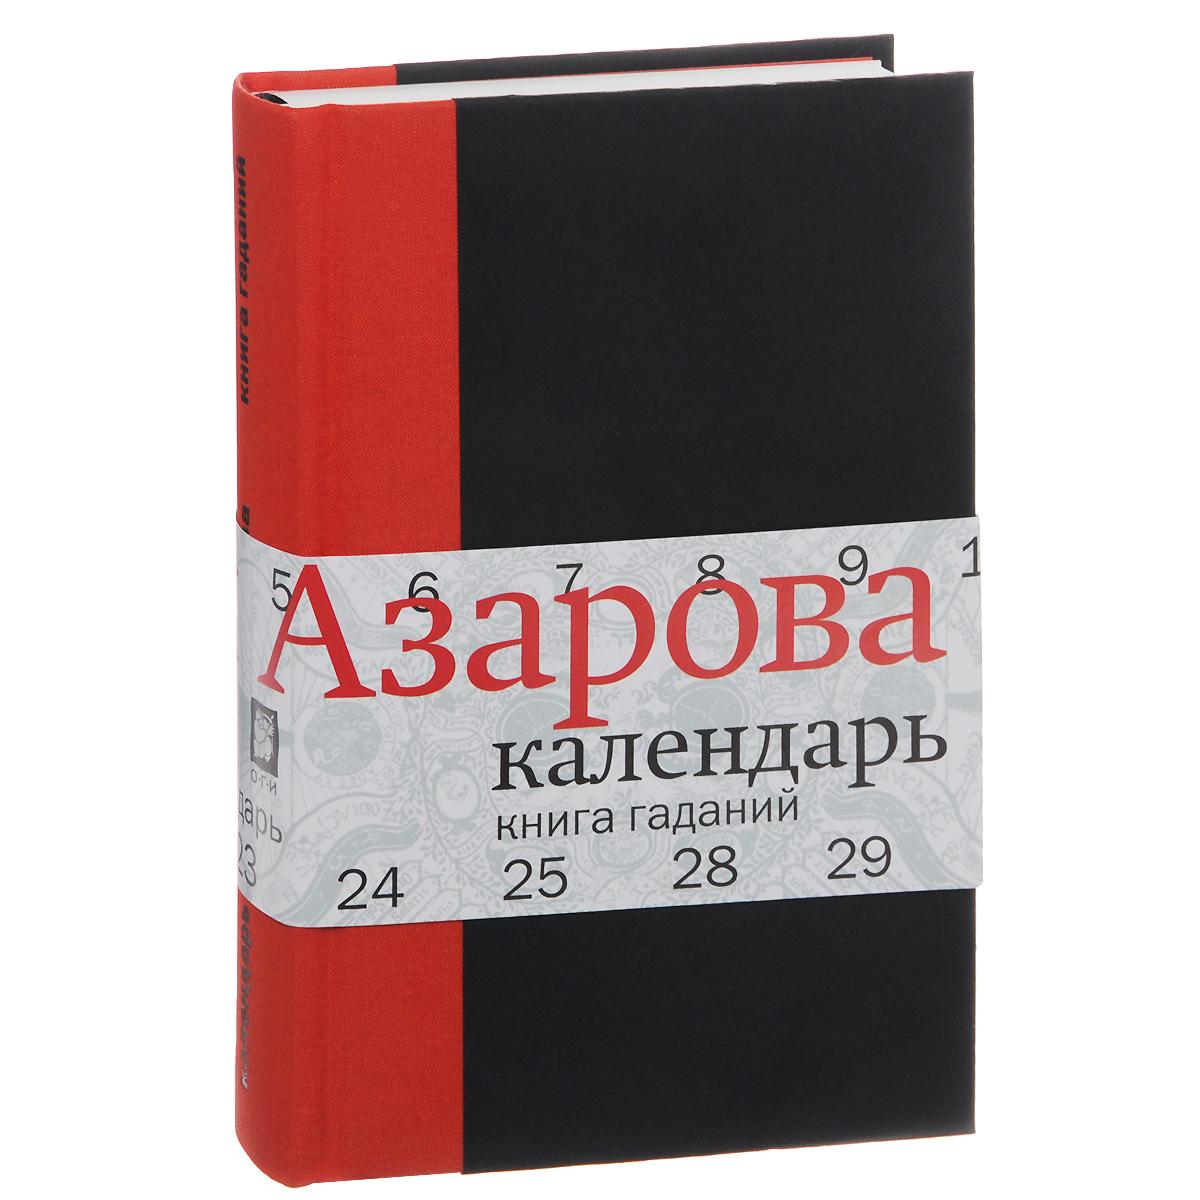 Наталия Азарова Календарь. Книга гаданий